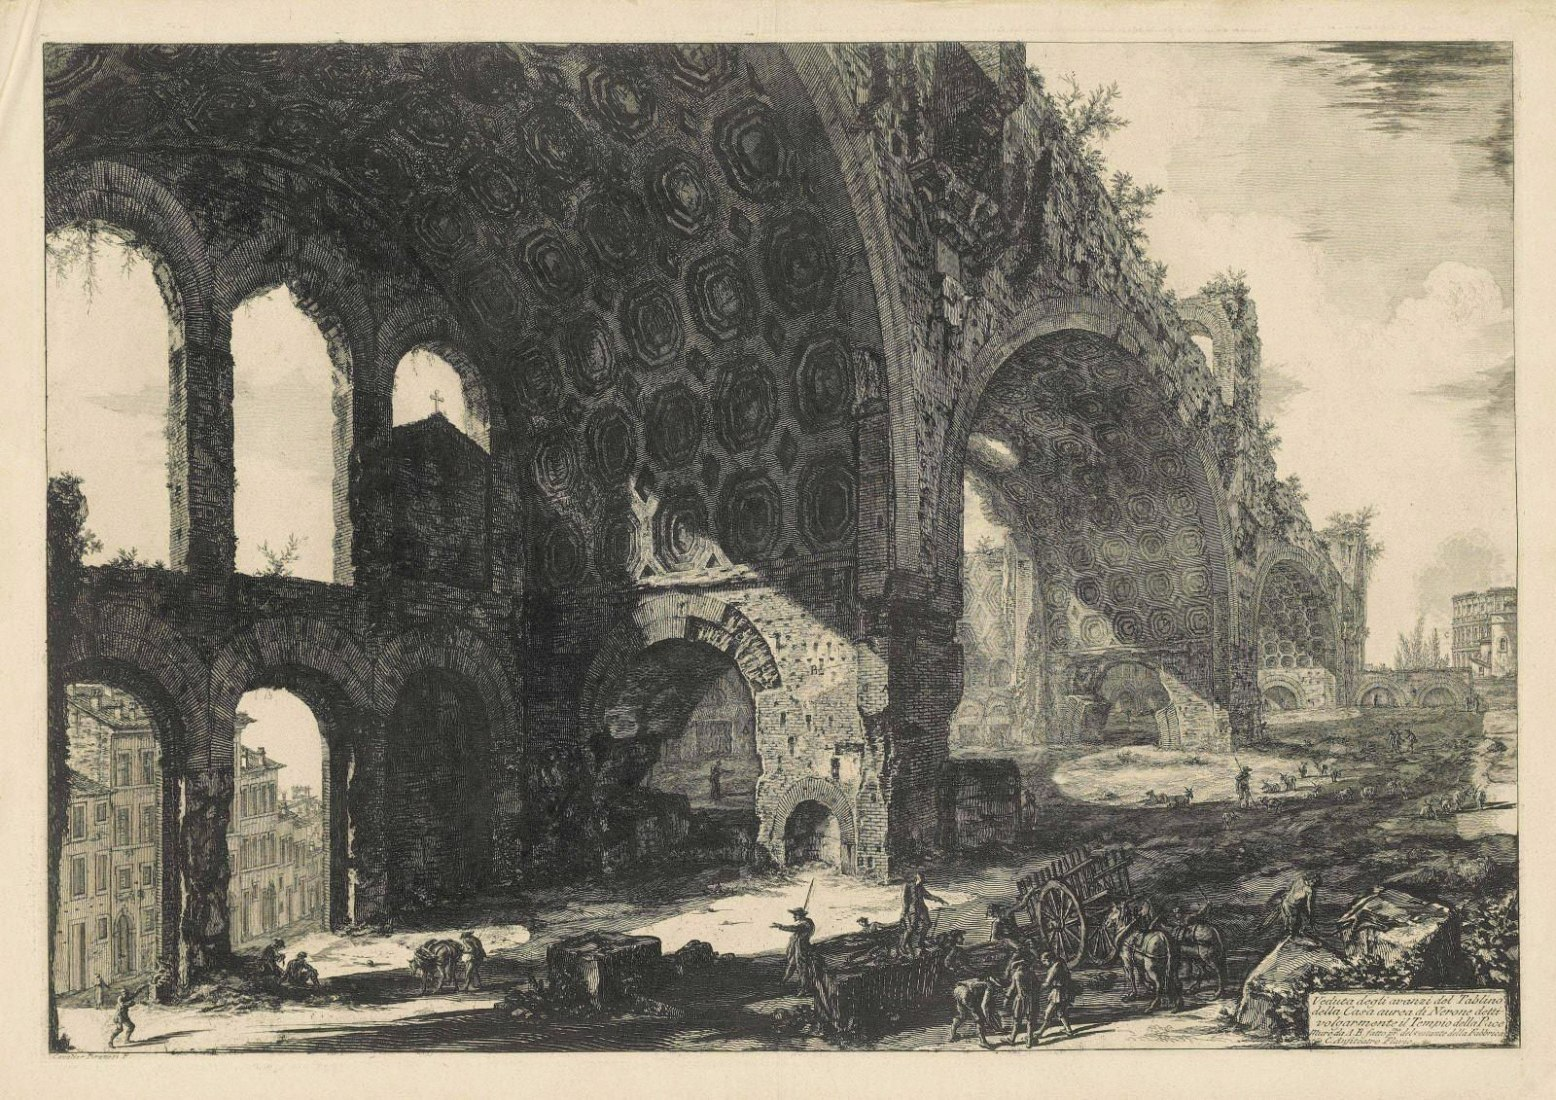 Giovanni Battista Piranesi, La Basílica de Maxentius, 1774, Museo Boijmans Van Beuningen, Rotterdam